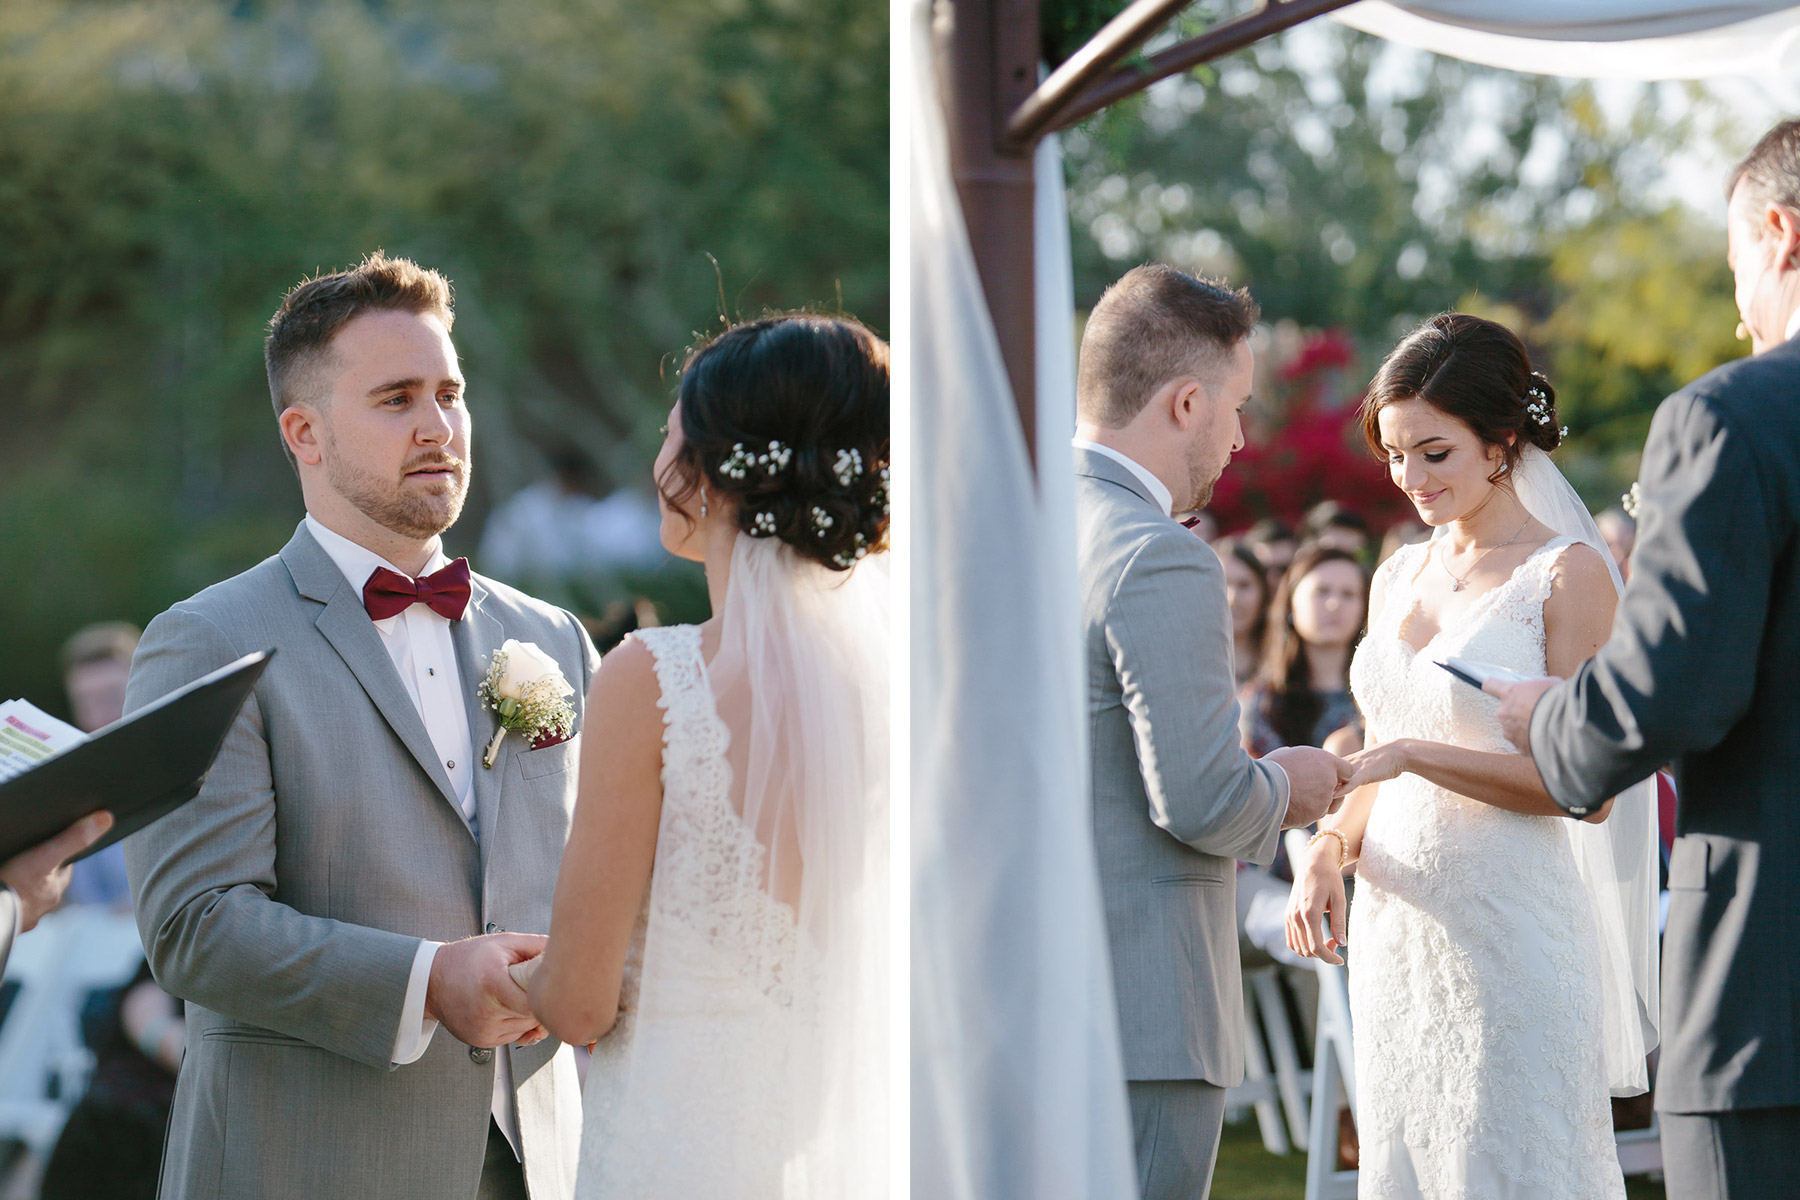 161210-Luxium-Weddings-Arizona-Matt-Jenny-Anthem-Golf-Country-Club-1031a.jpg